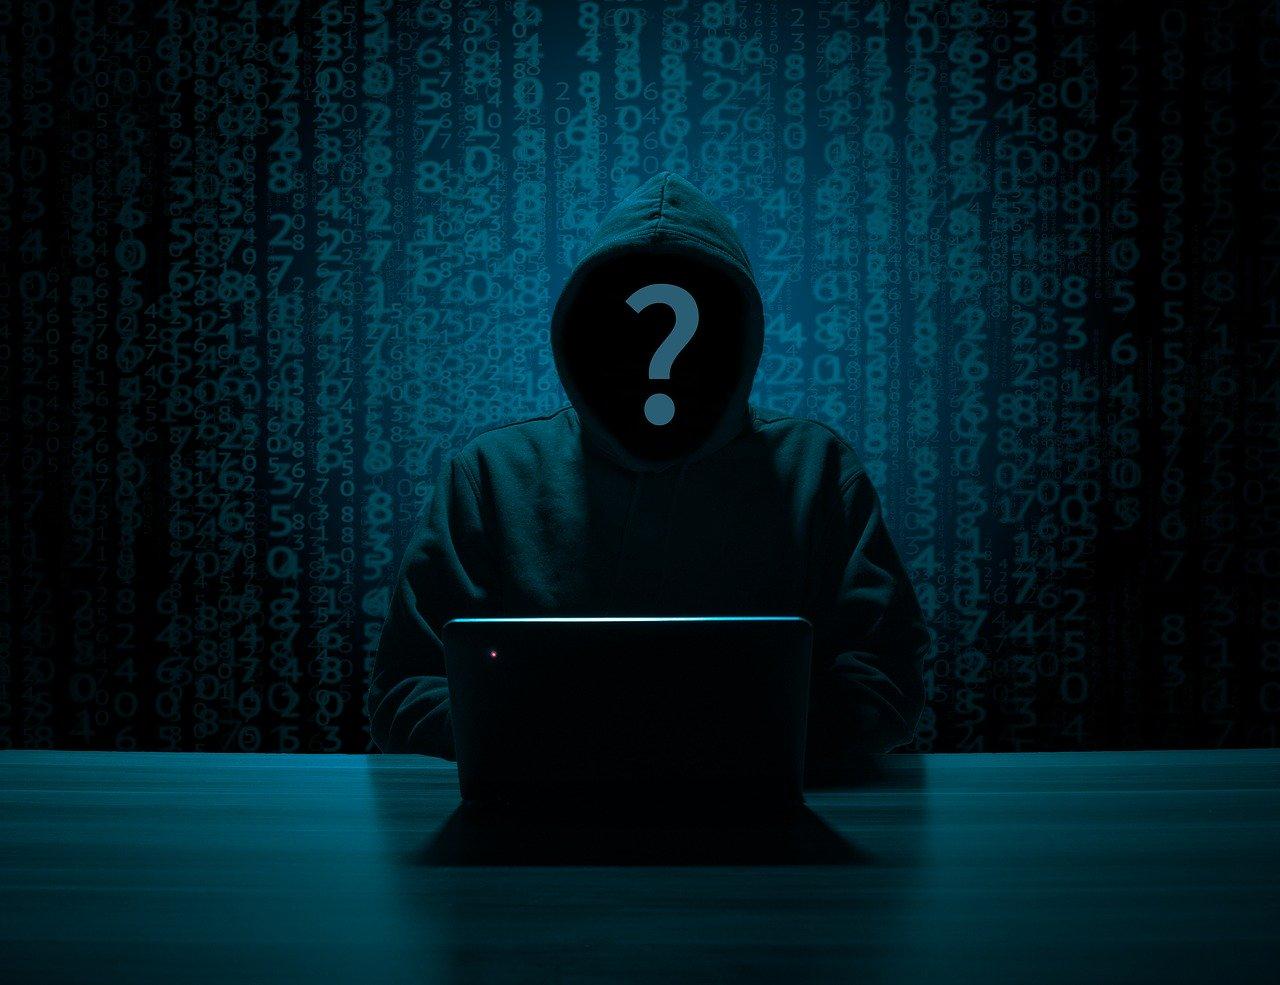 Norton Security Life Lock Scam Order Receipt